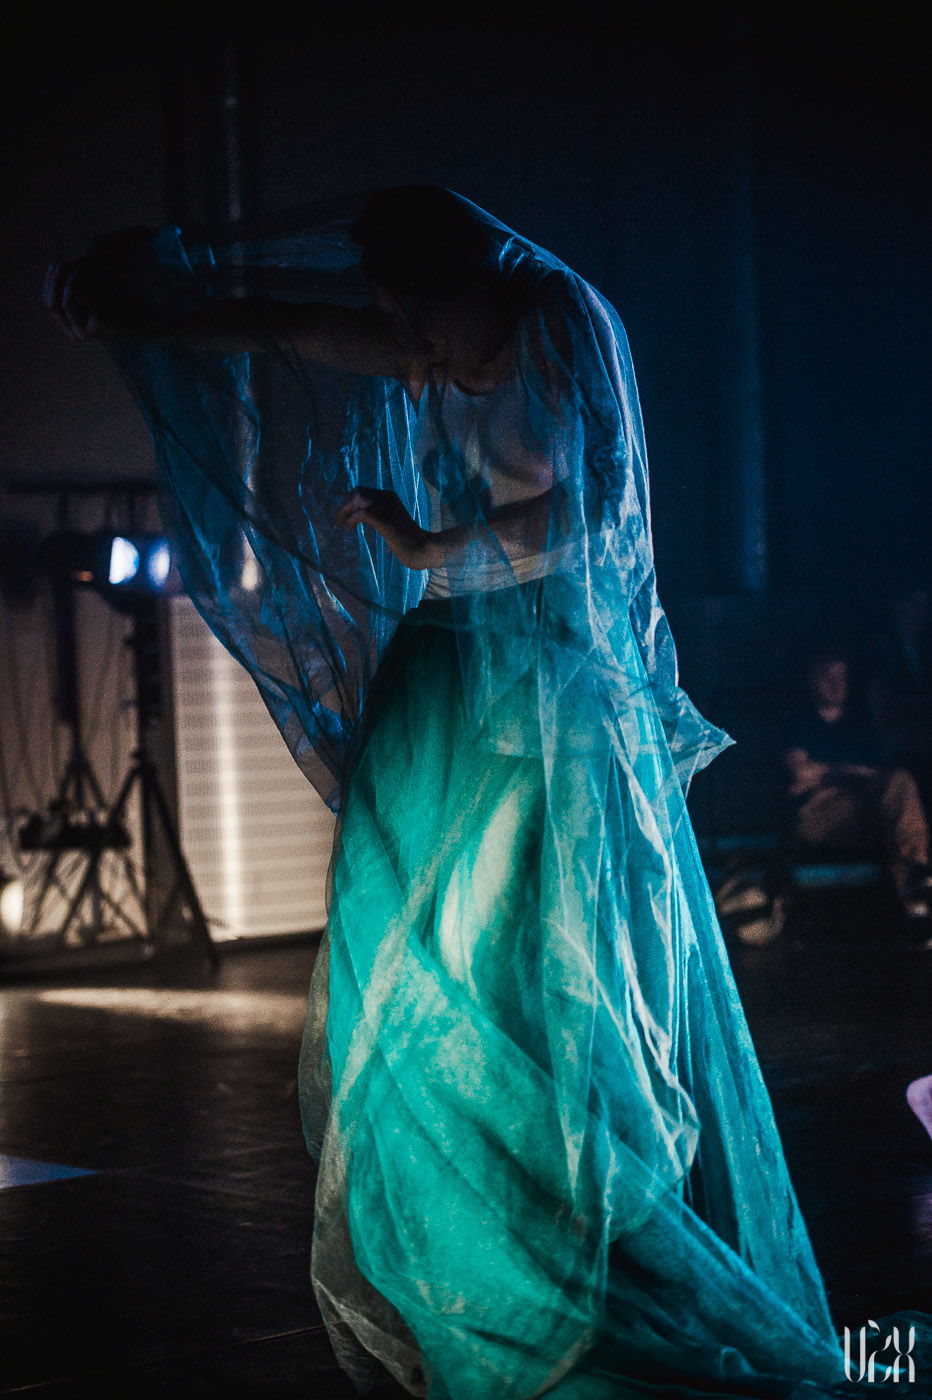 E.sabaliauskaite Vzx.lt Faustas Teatras Event 026